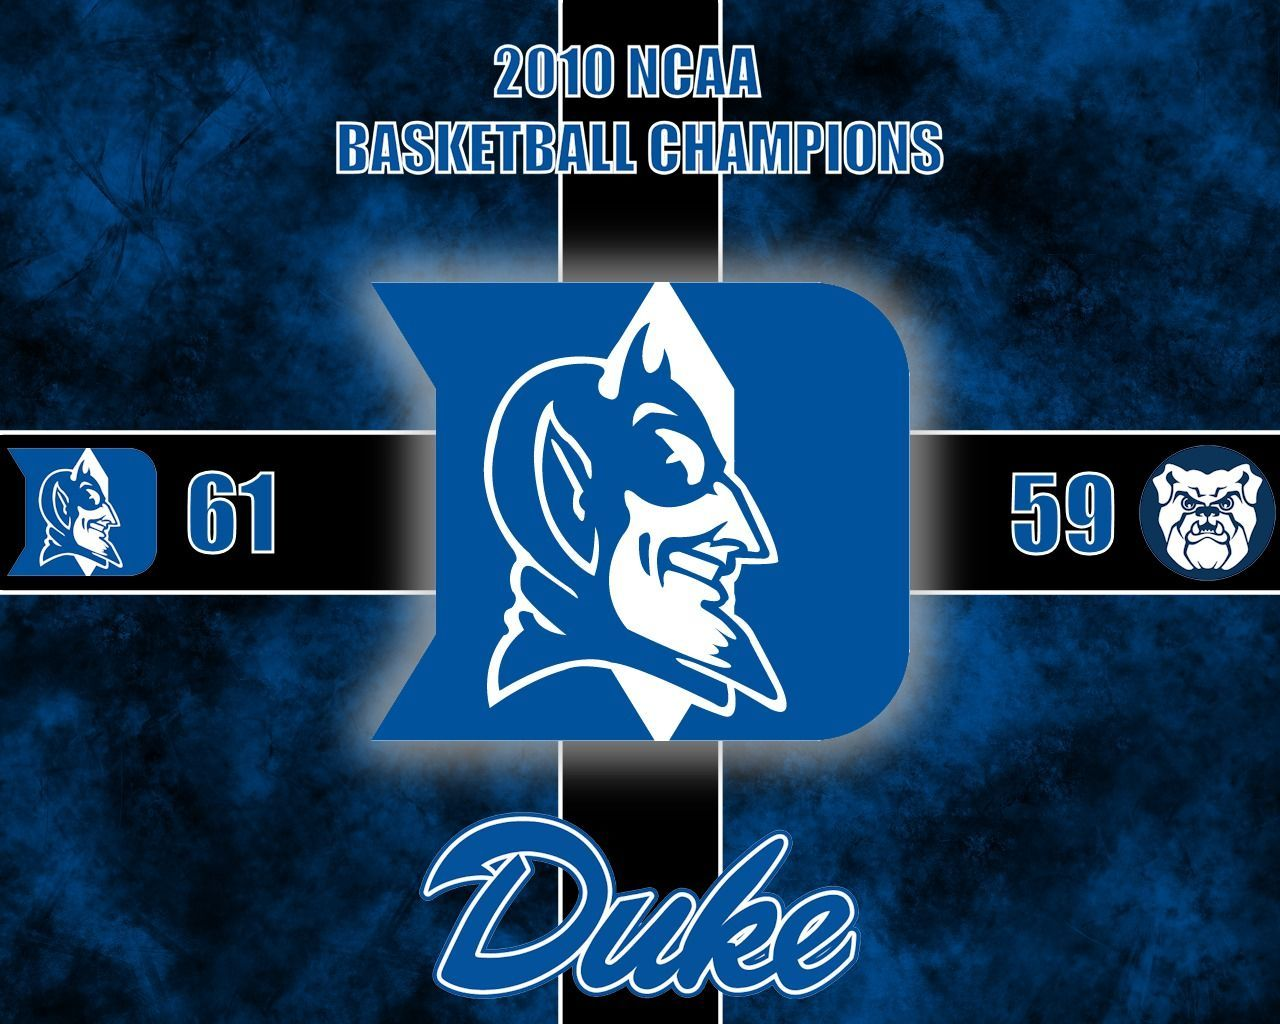 Duke Basketball Wallpapers (39 Wallpapers) – Adorable ...